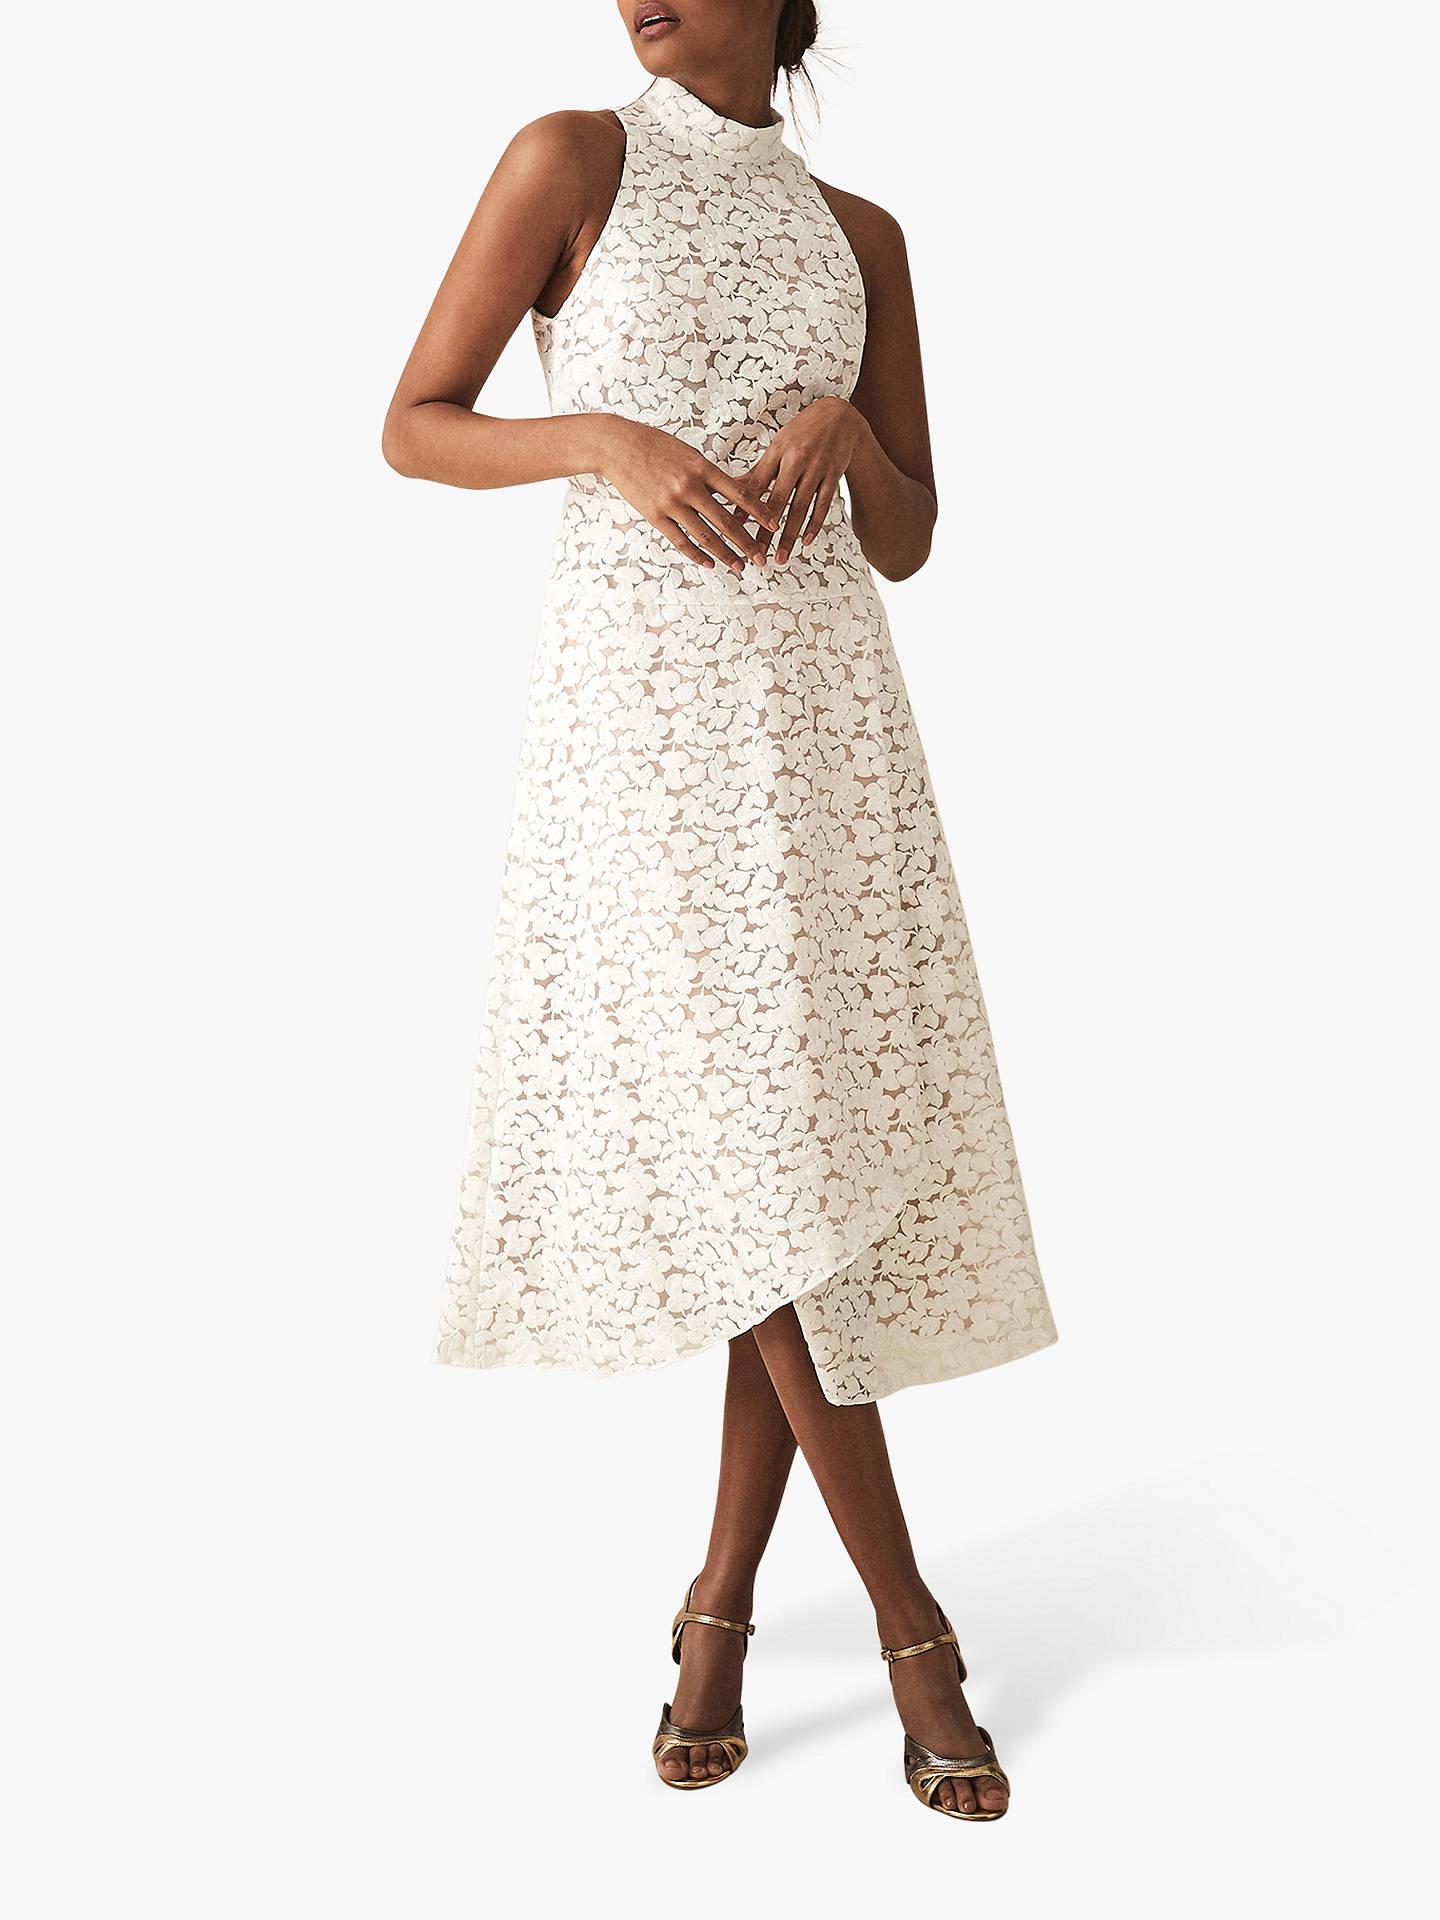 Reiss Siri Lace Dress White At John Lewis Partners